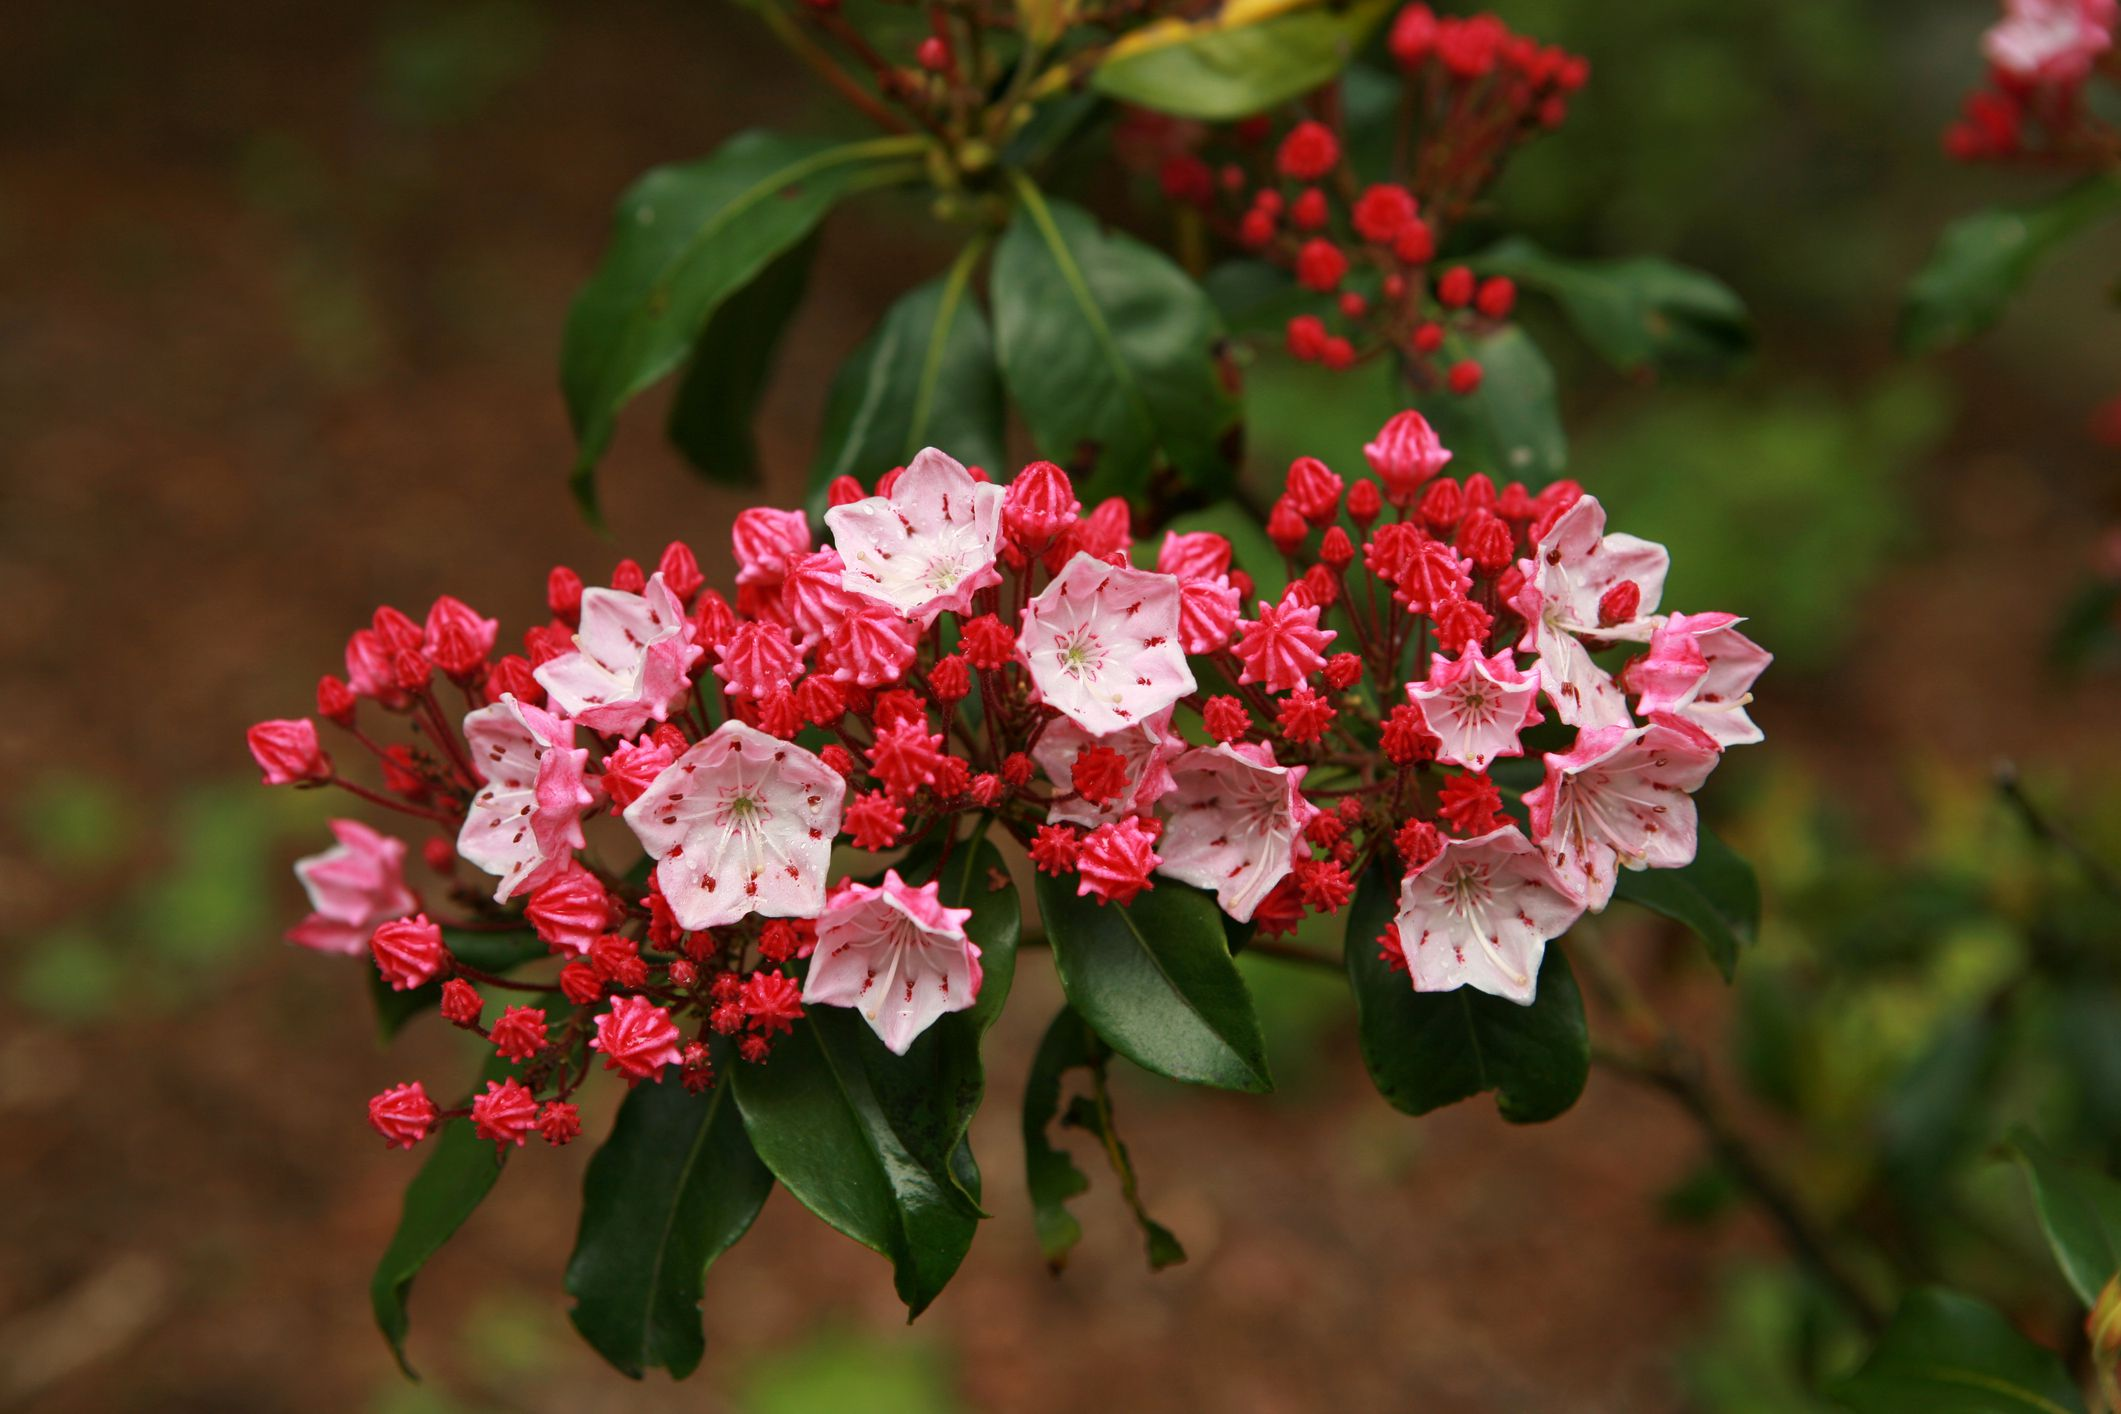 How To Grow Mountain Laurel Plants